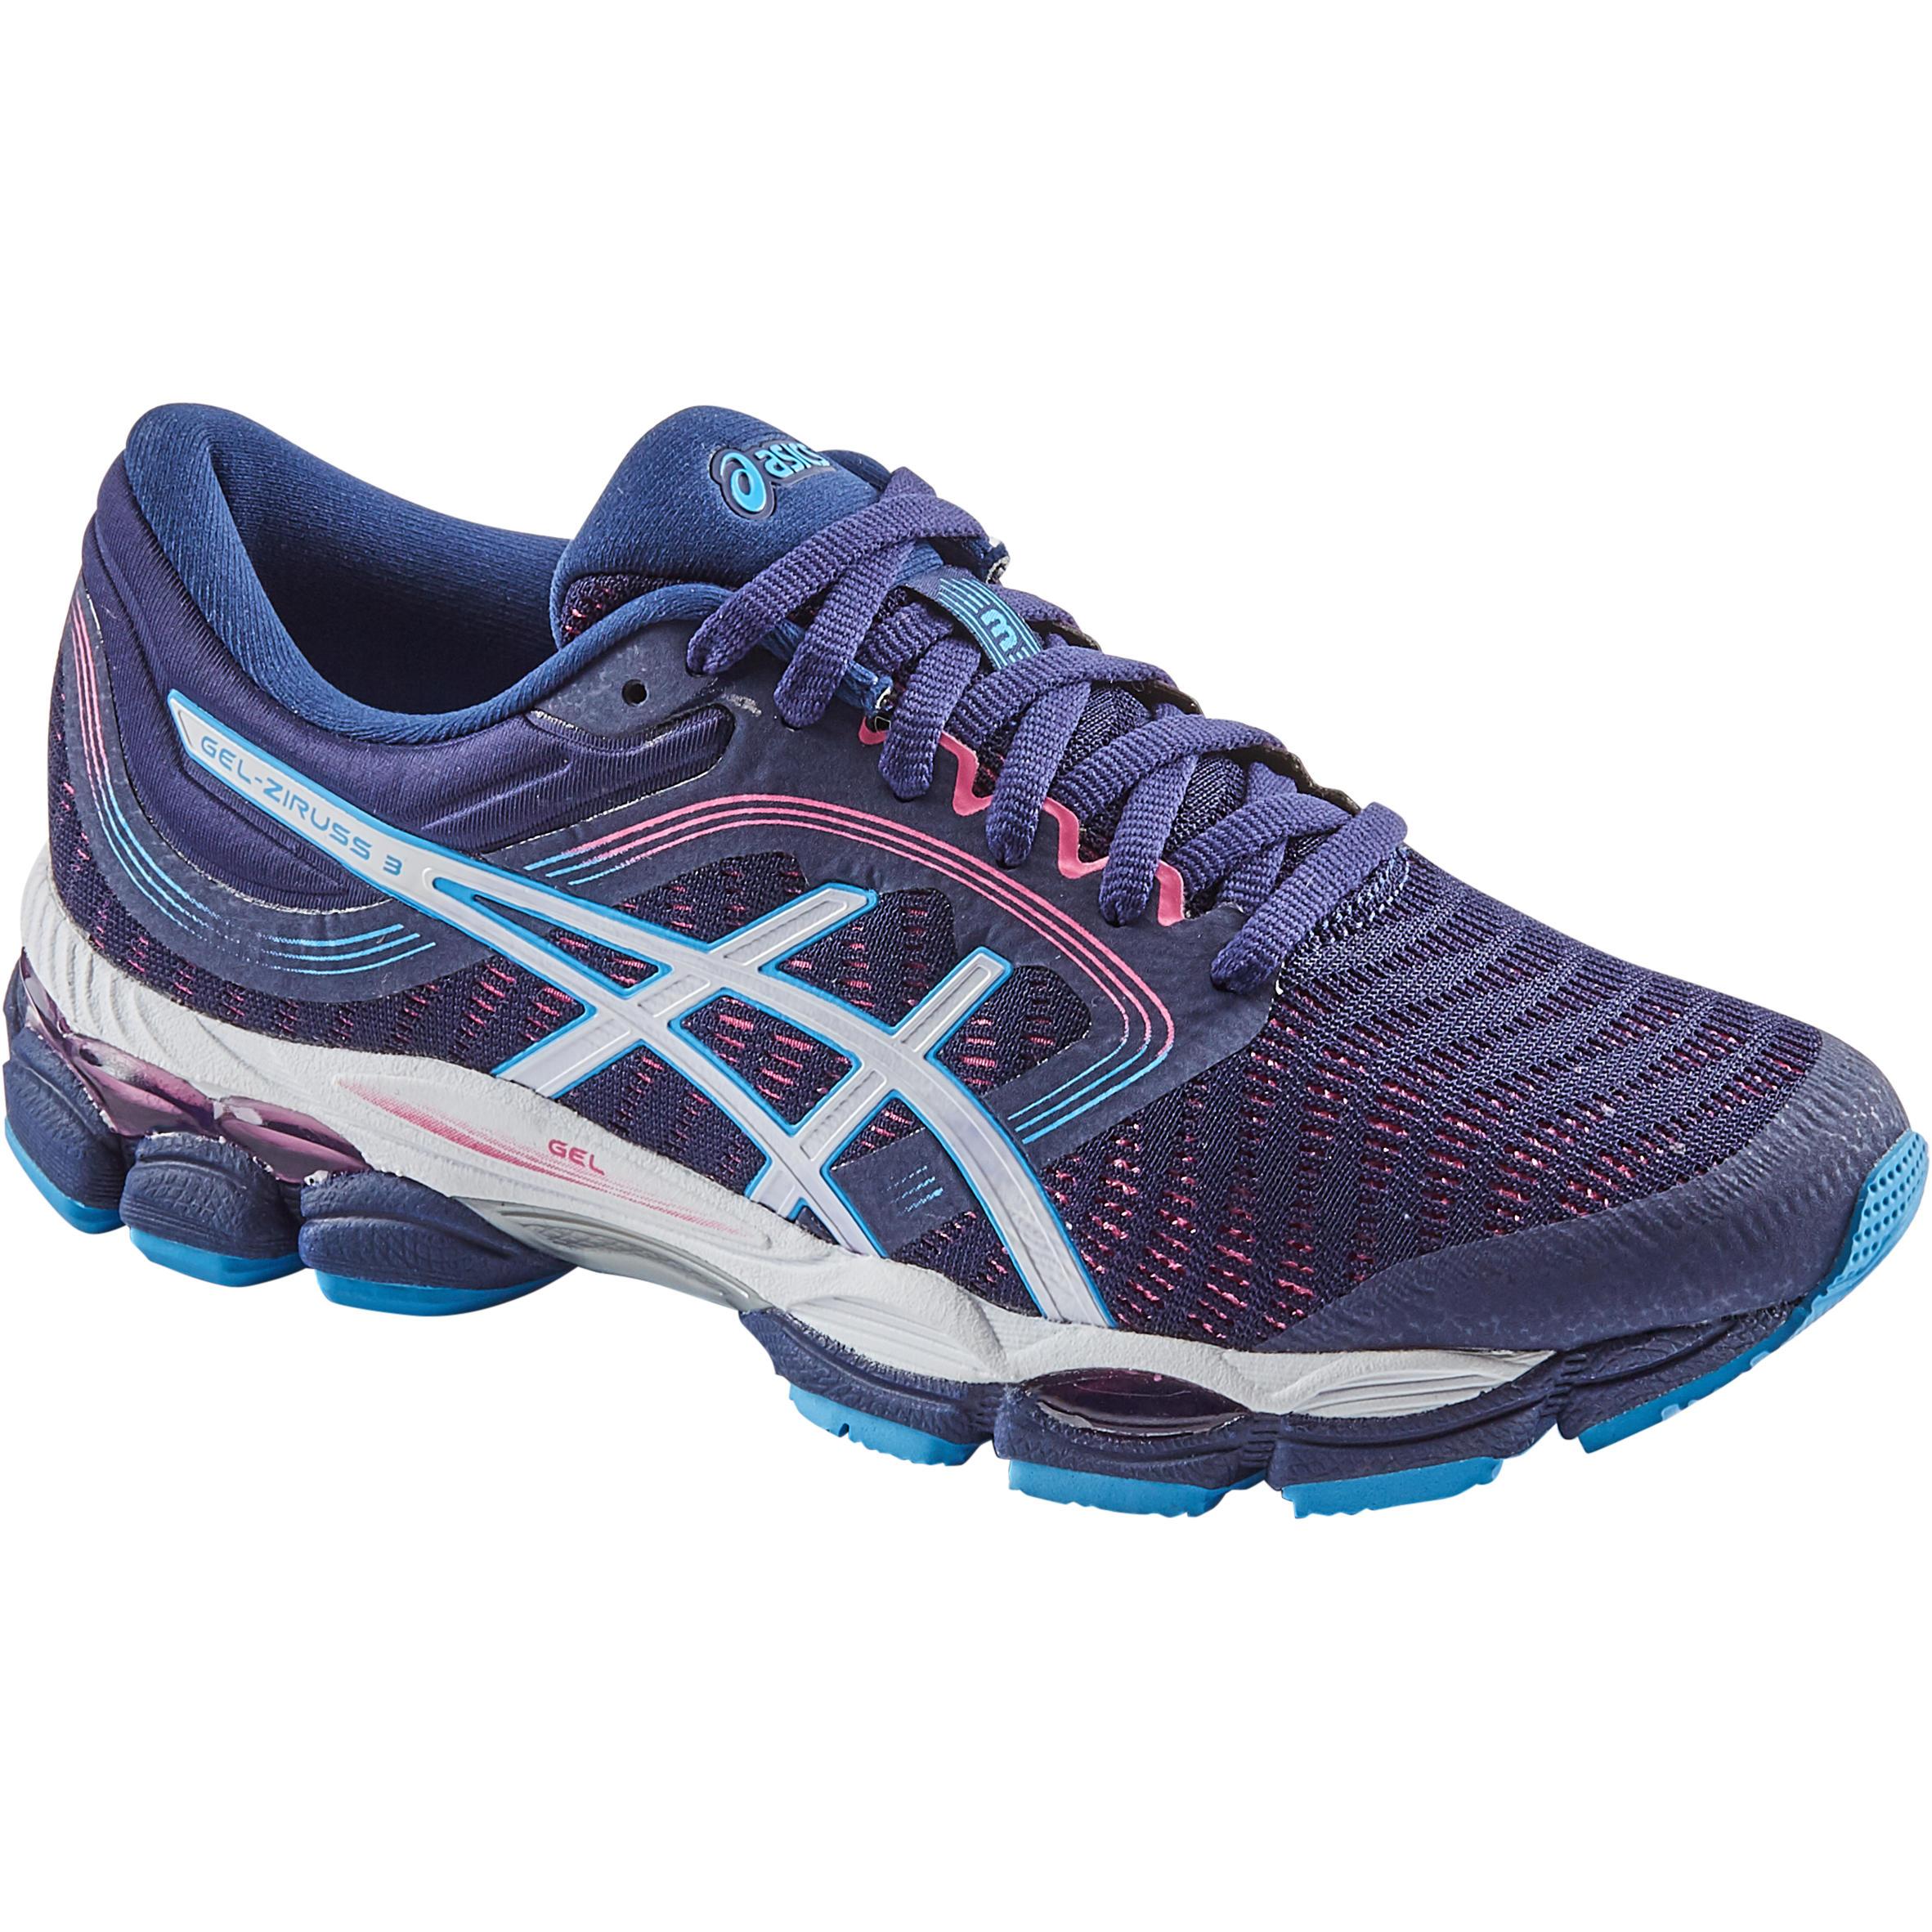 asics womens running shoes australia online zapatillas